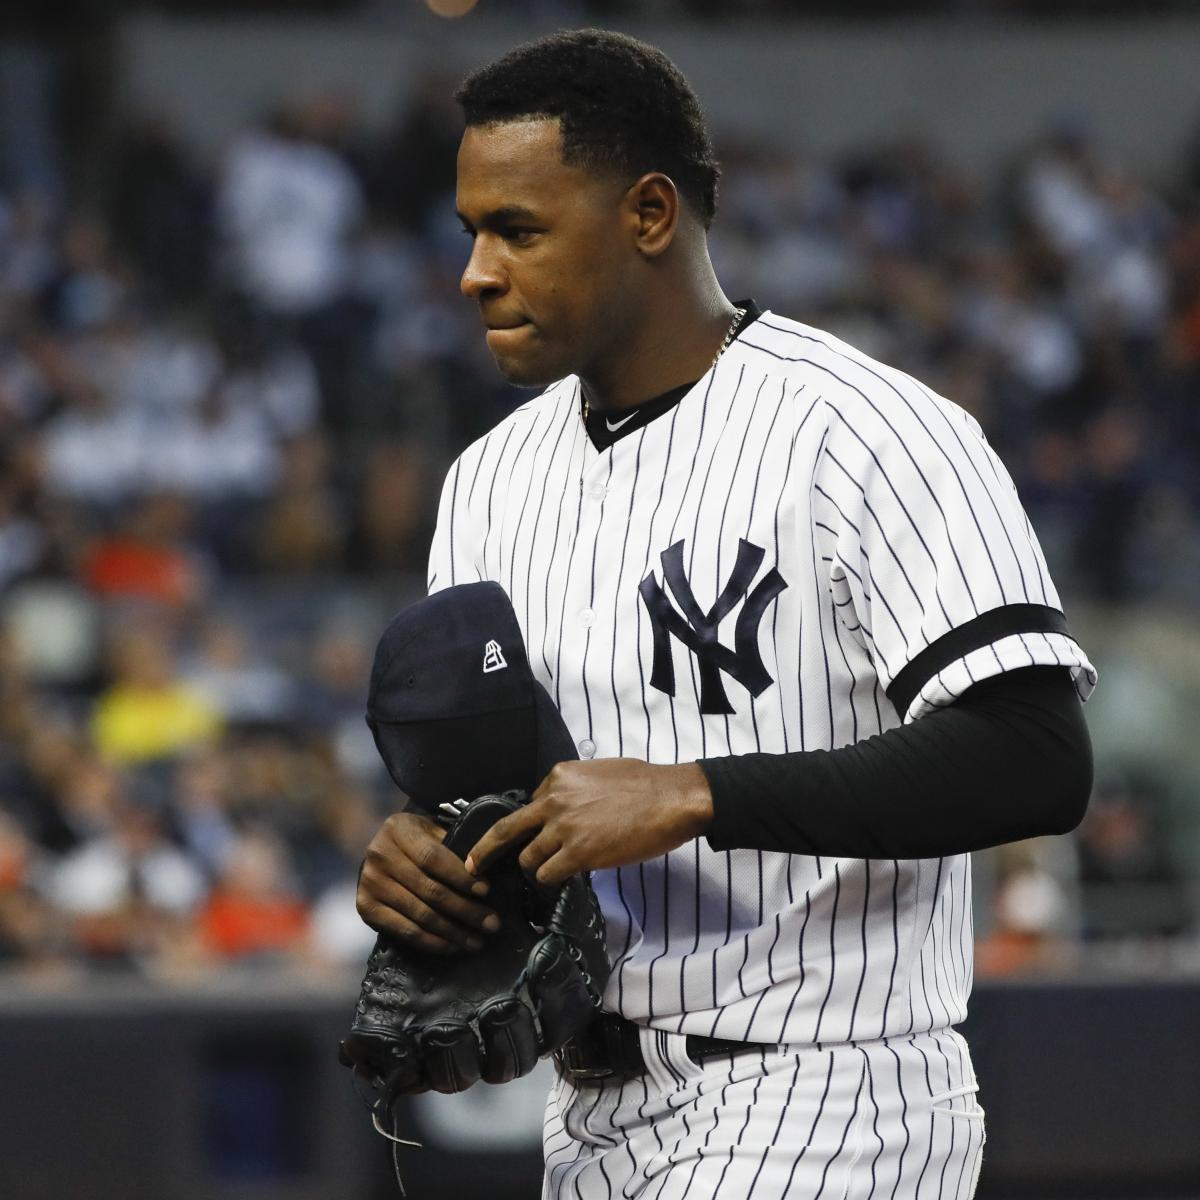 Yankees News: Luis Severino Undergoes Tommy John Surgery; Has Bone Chip Removed